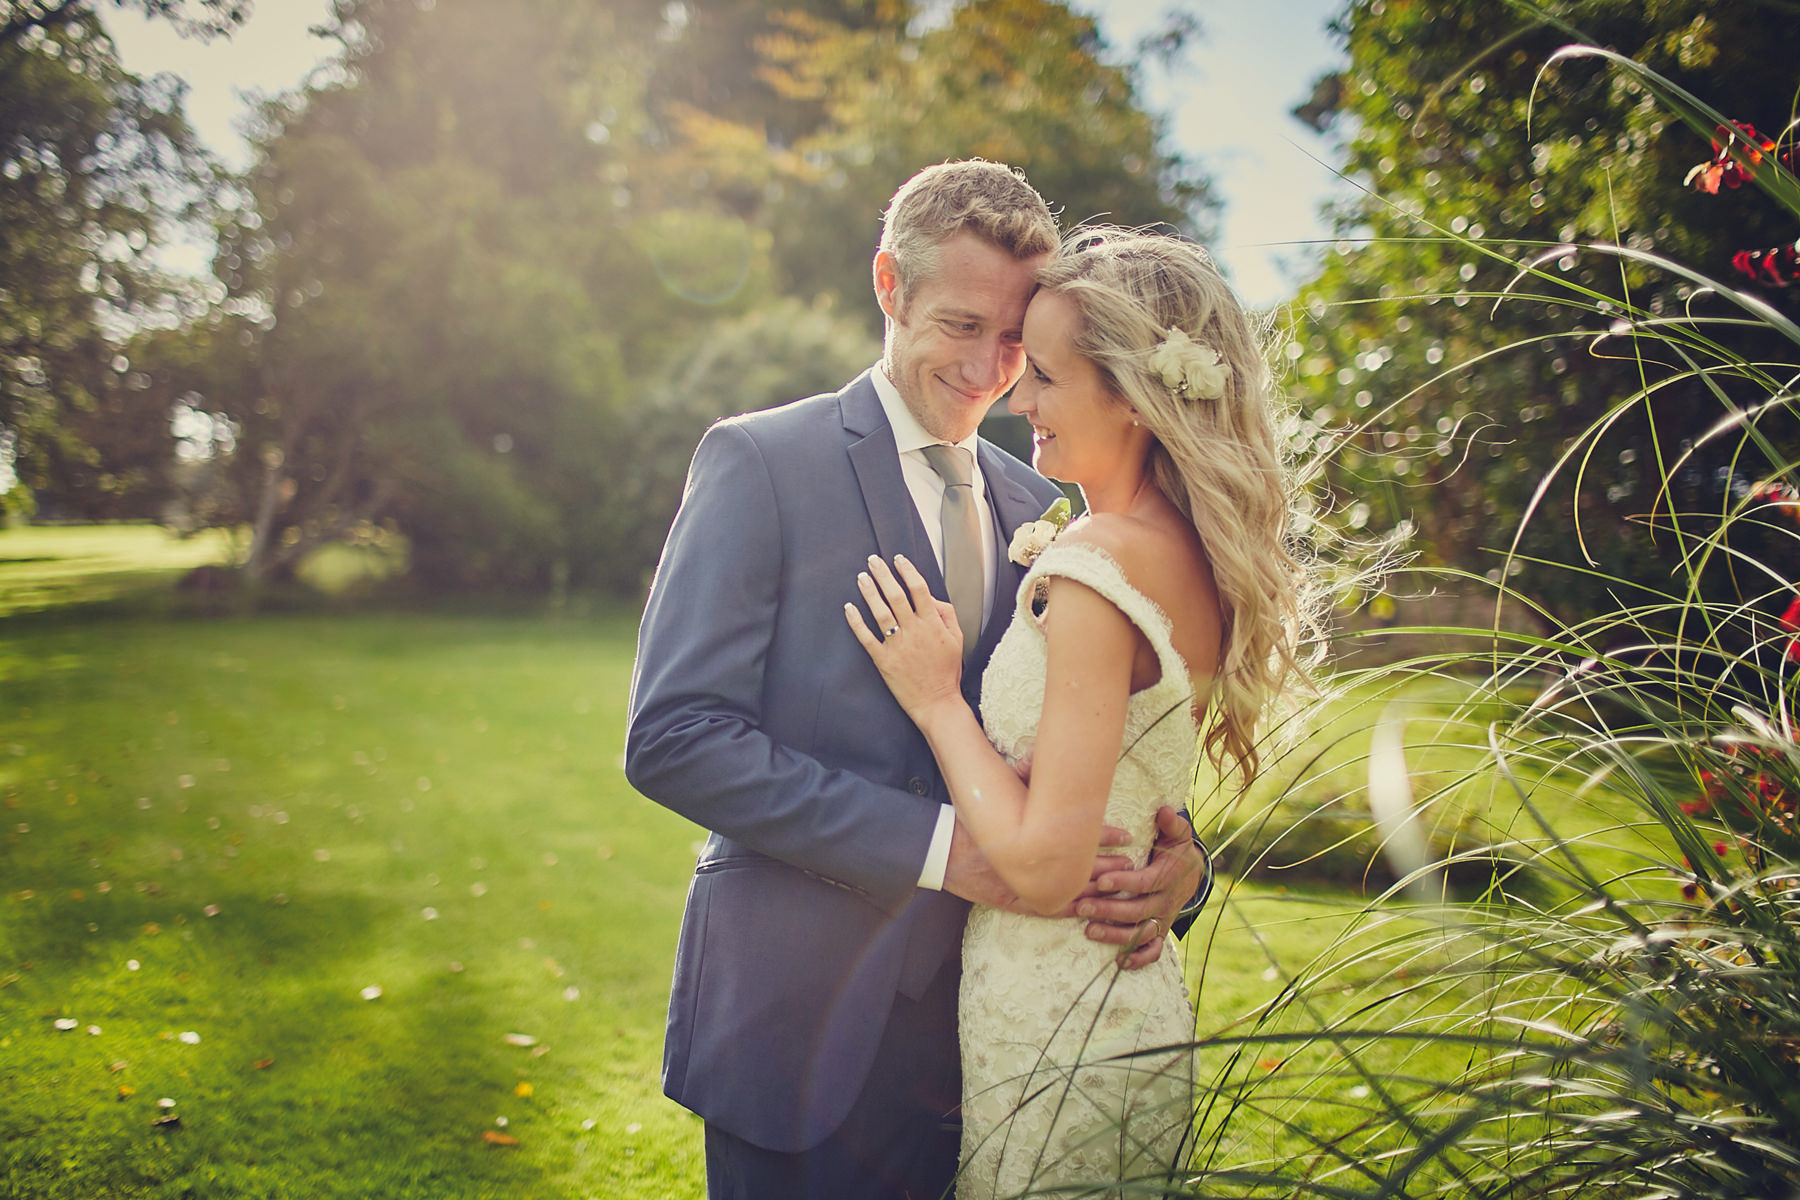 Wedding at Borris House co.Carlow 053 - Borris House wedding | Cara & David